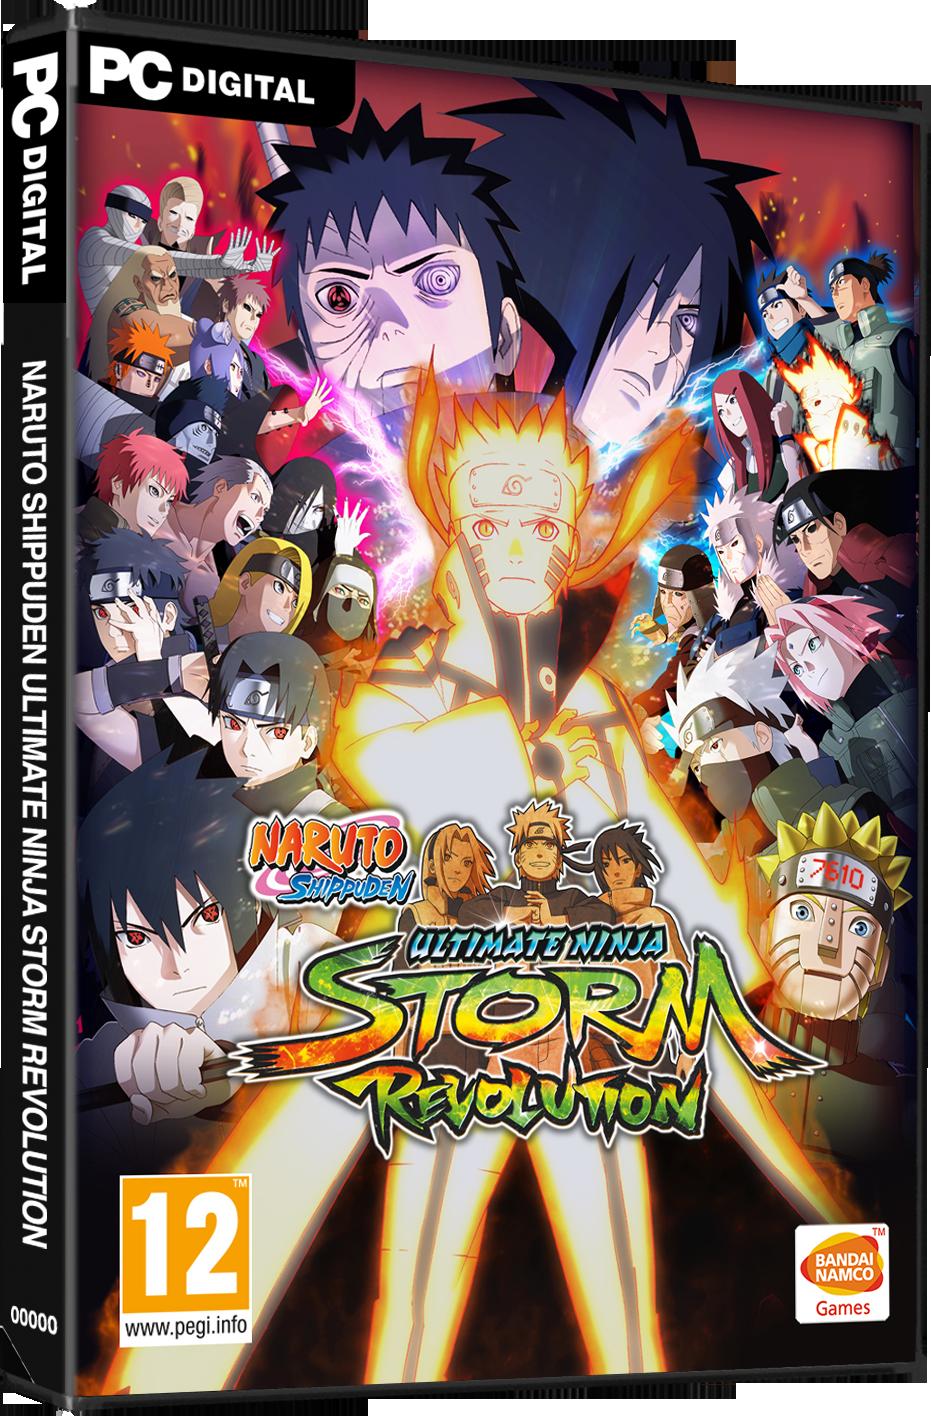 Naruto shippuden ultimate ninja storm 4 hint для андроид скачать apk.